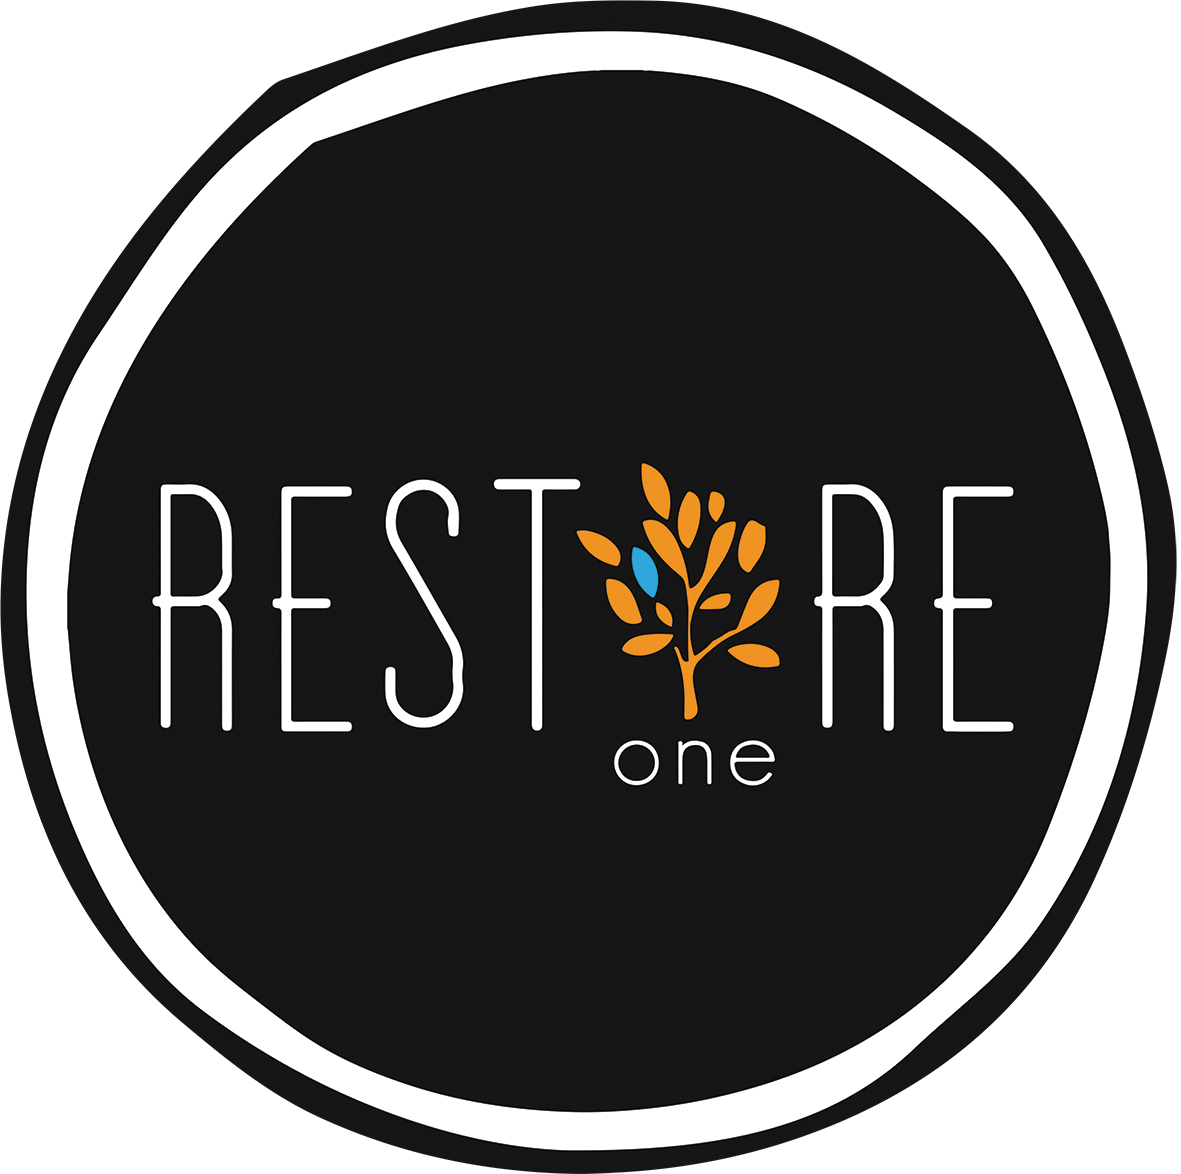 Restore One logo